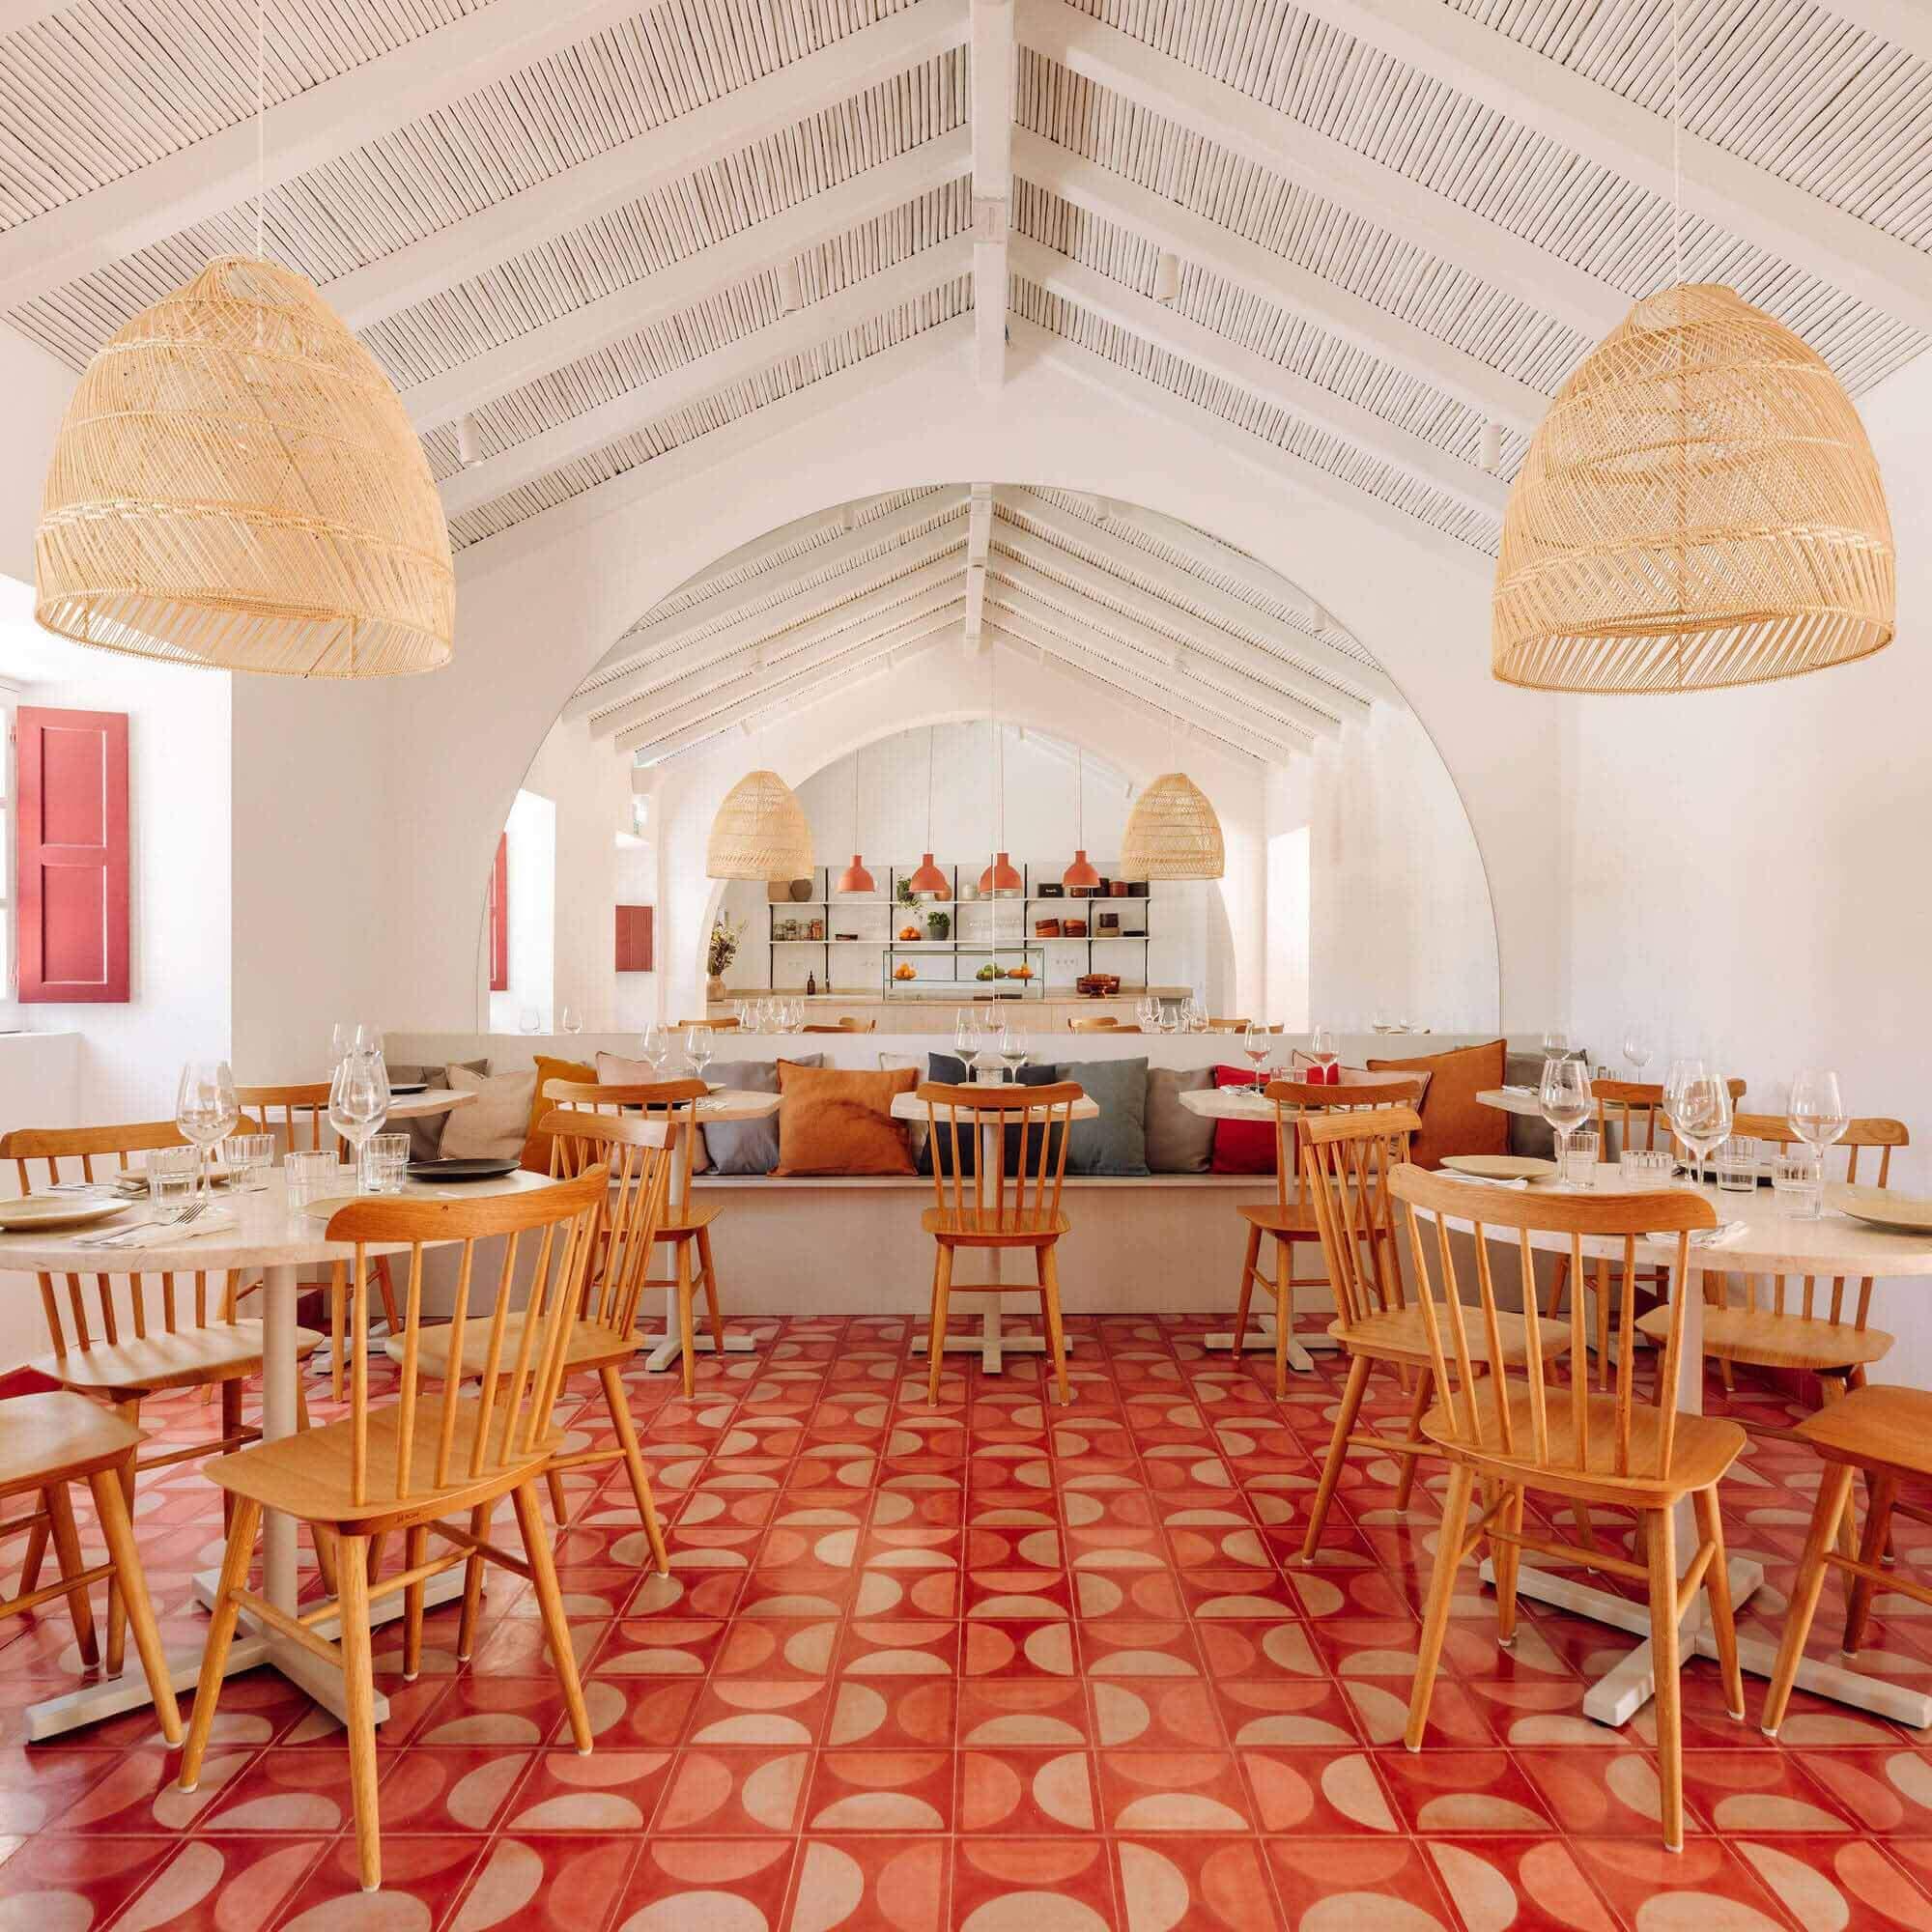 Ресторан Abranda / LADO Arquitectura e Design